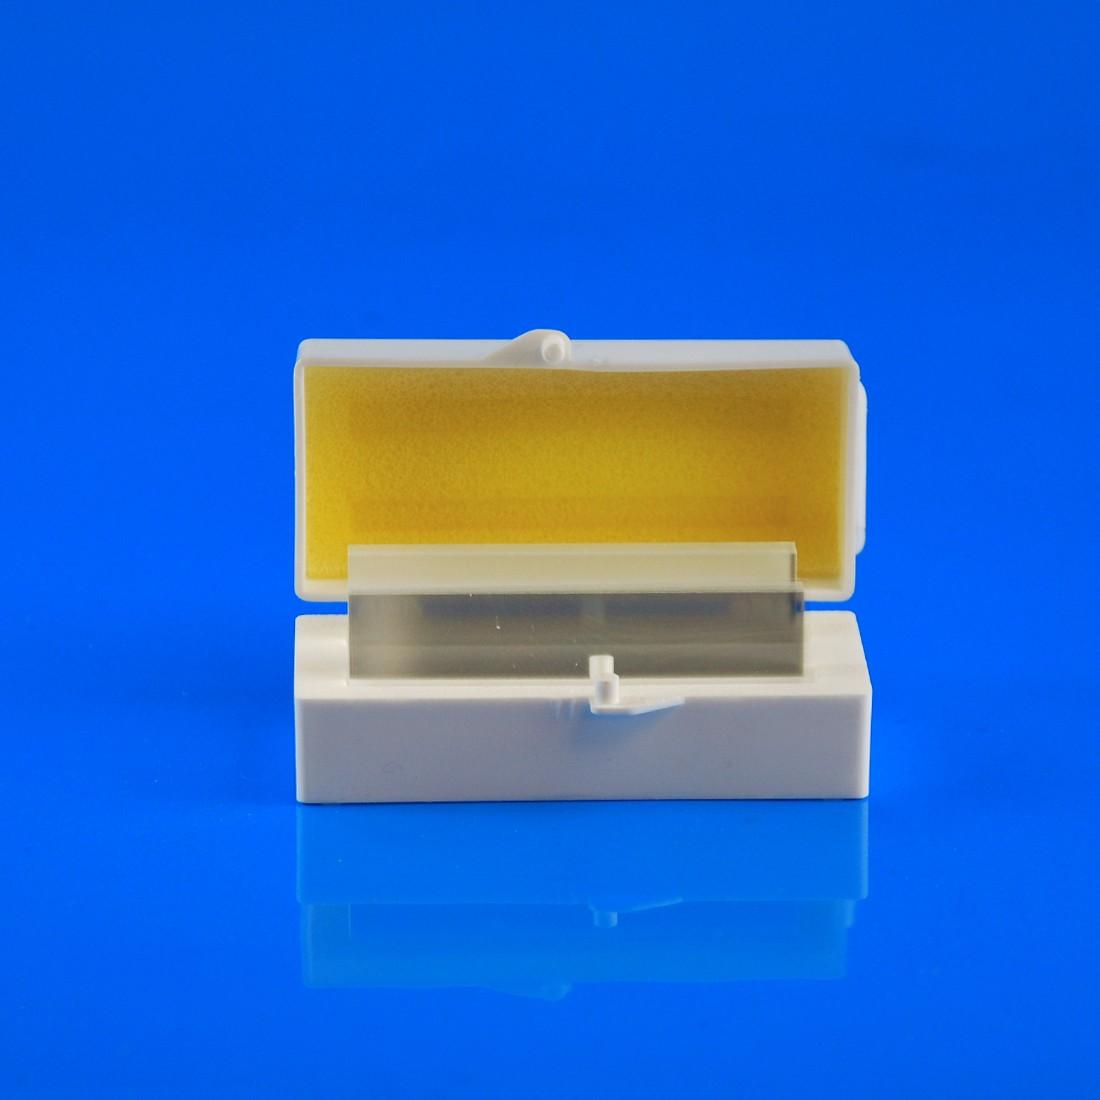 Microscope Slide Coverslips, Glass, 24mm x 60mm